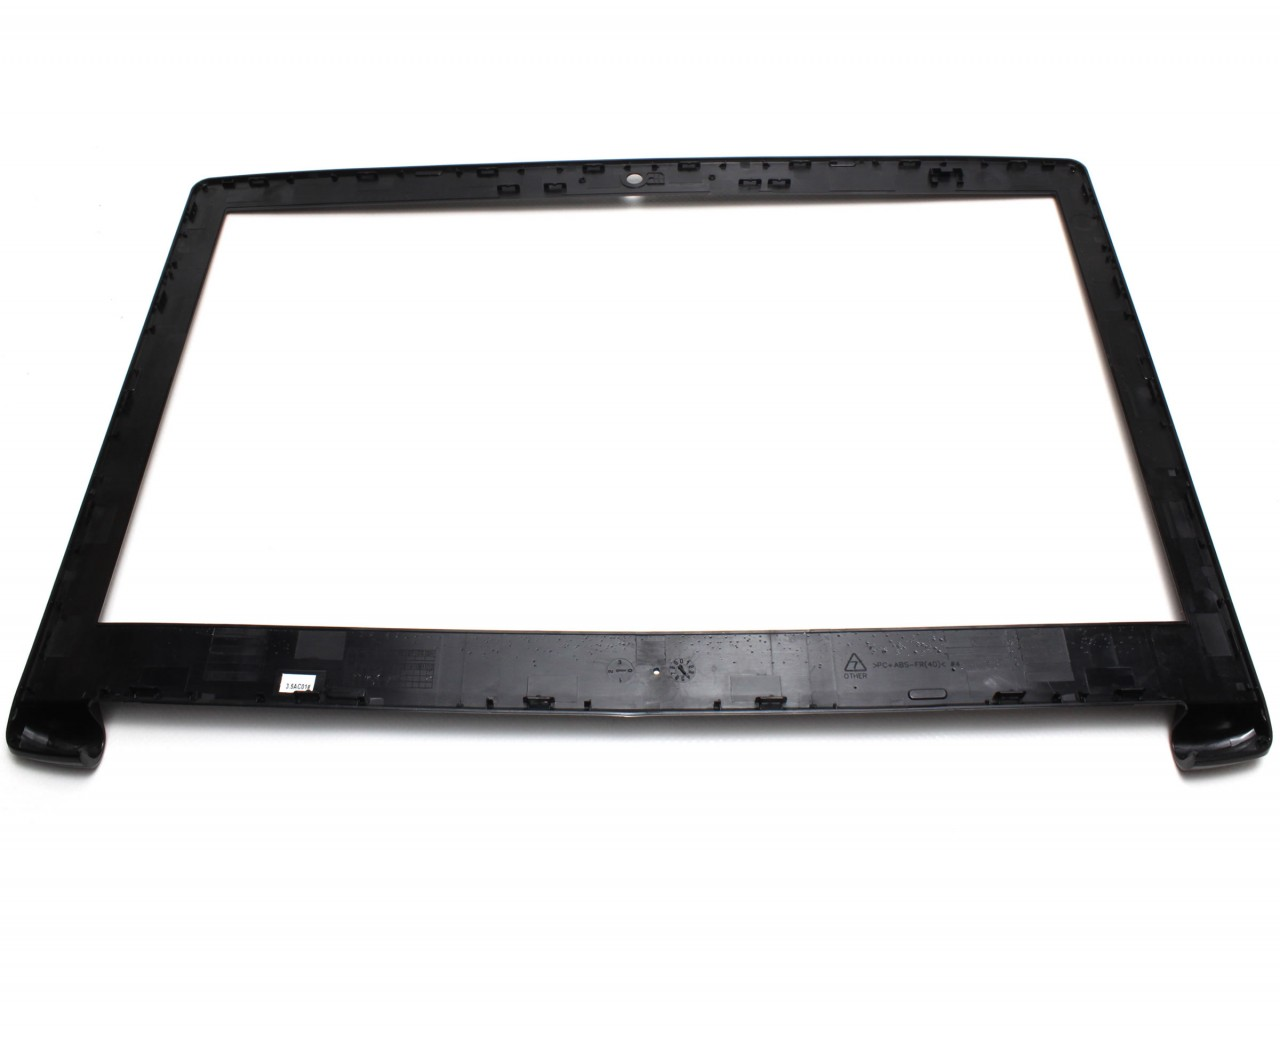 Rama Display Acer Aspire A315-53 Bezel Front Cover Neagra imagine powerlaptop.ro 2021